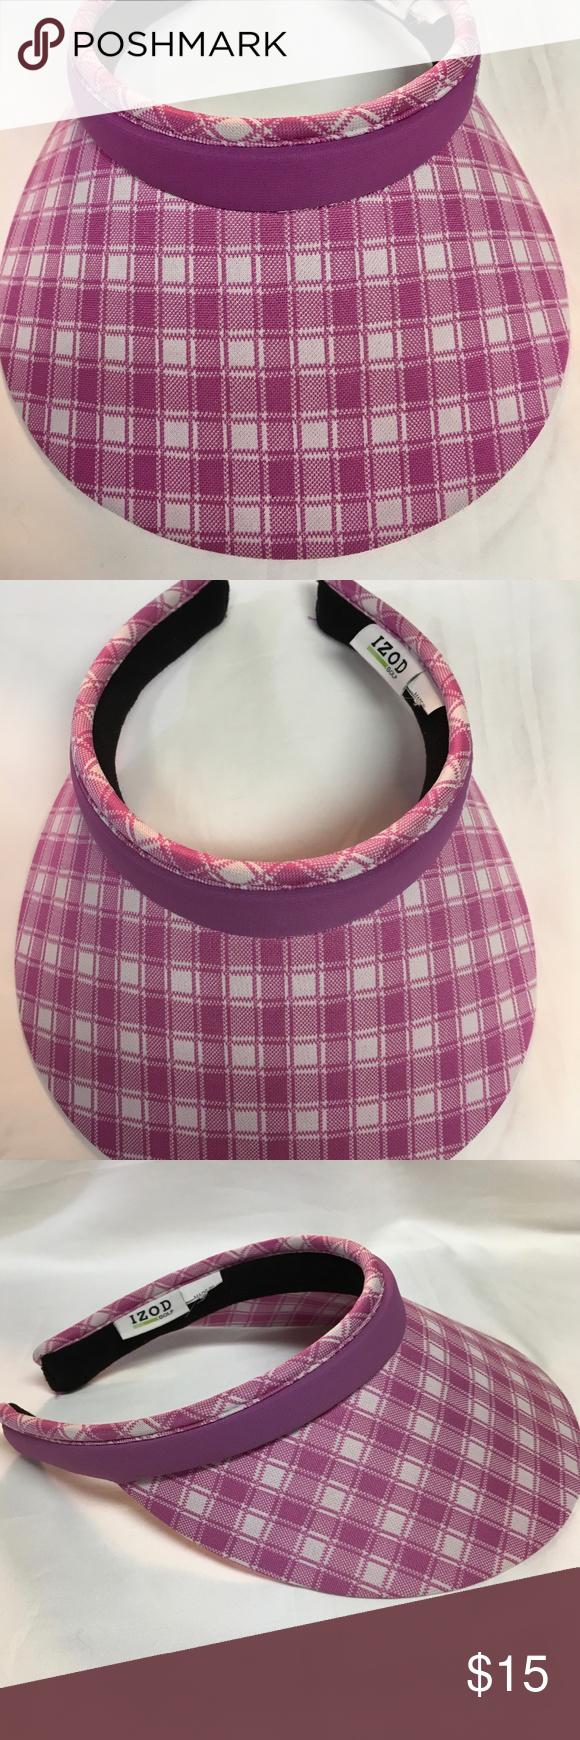 IZOD Women s Golf Visor Pink Gingham IZOD Women s Golf Visor Pink Gingham •  Color  Pink Gingham • Design  Visor • Width  5 in • Length  6.5 in Label  was cut ... ac00c95246f